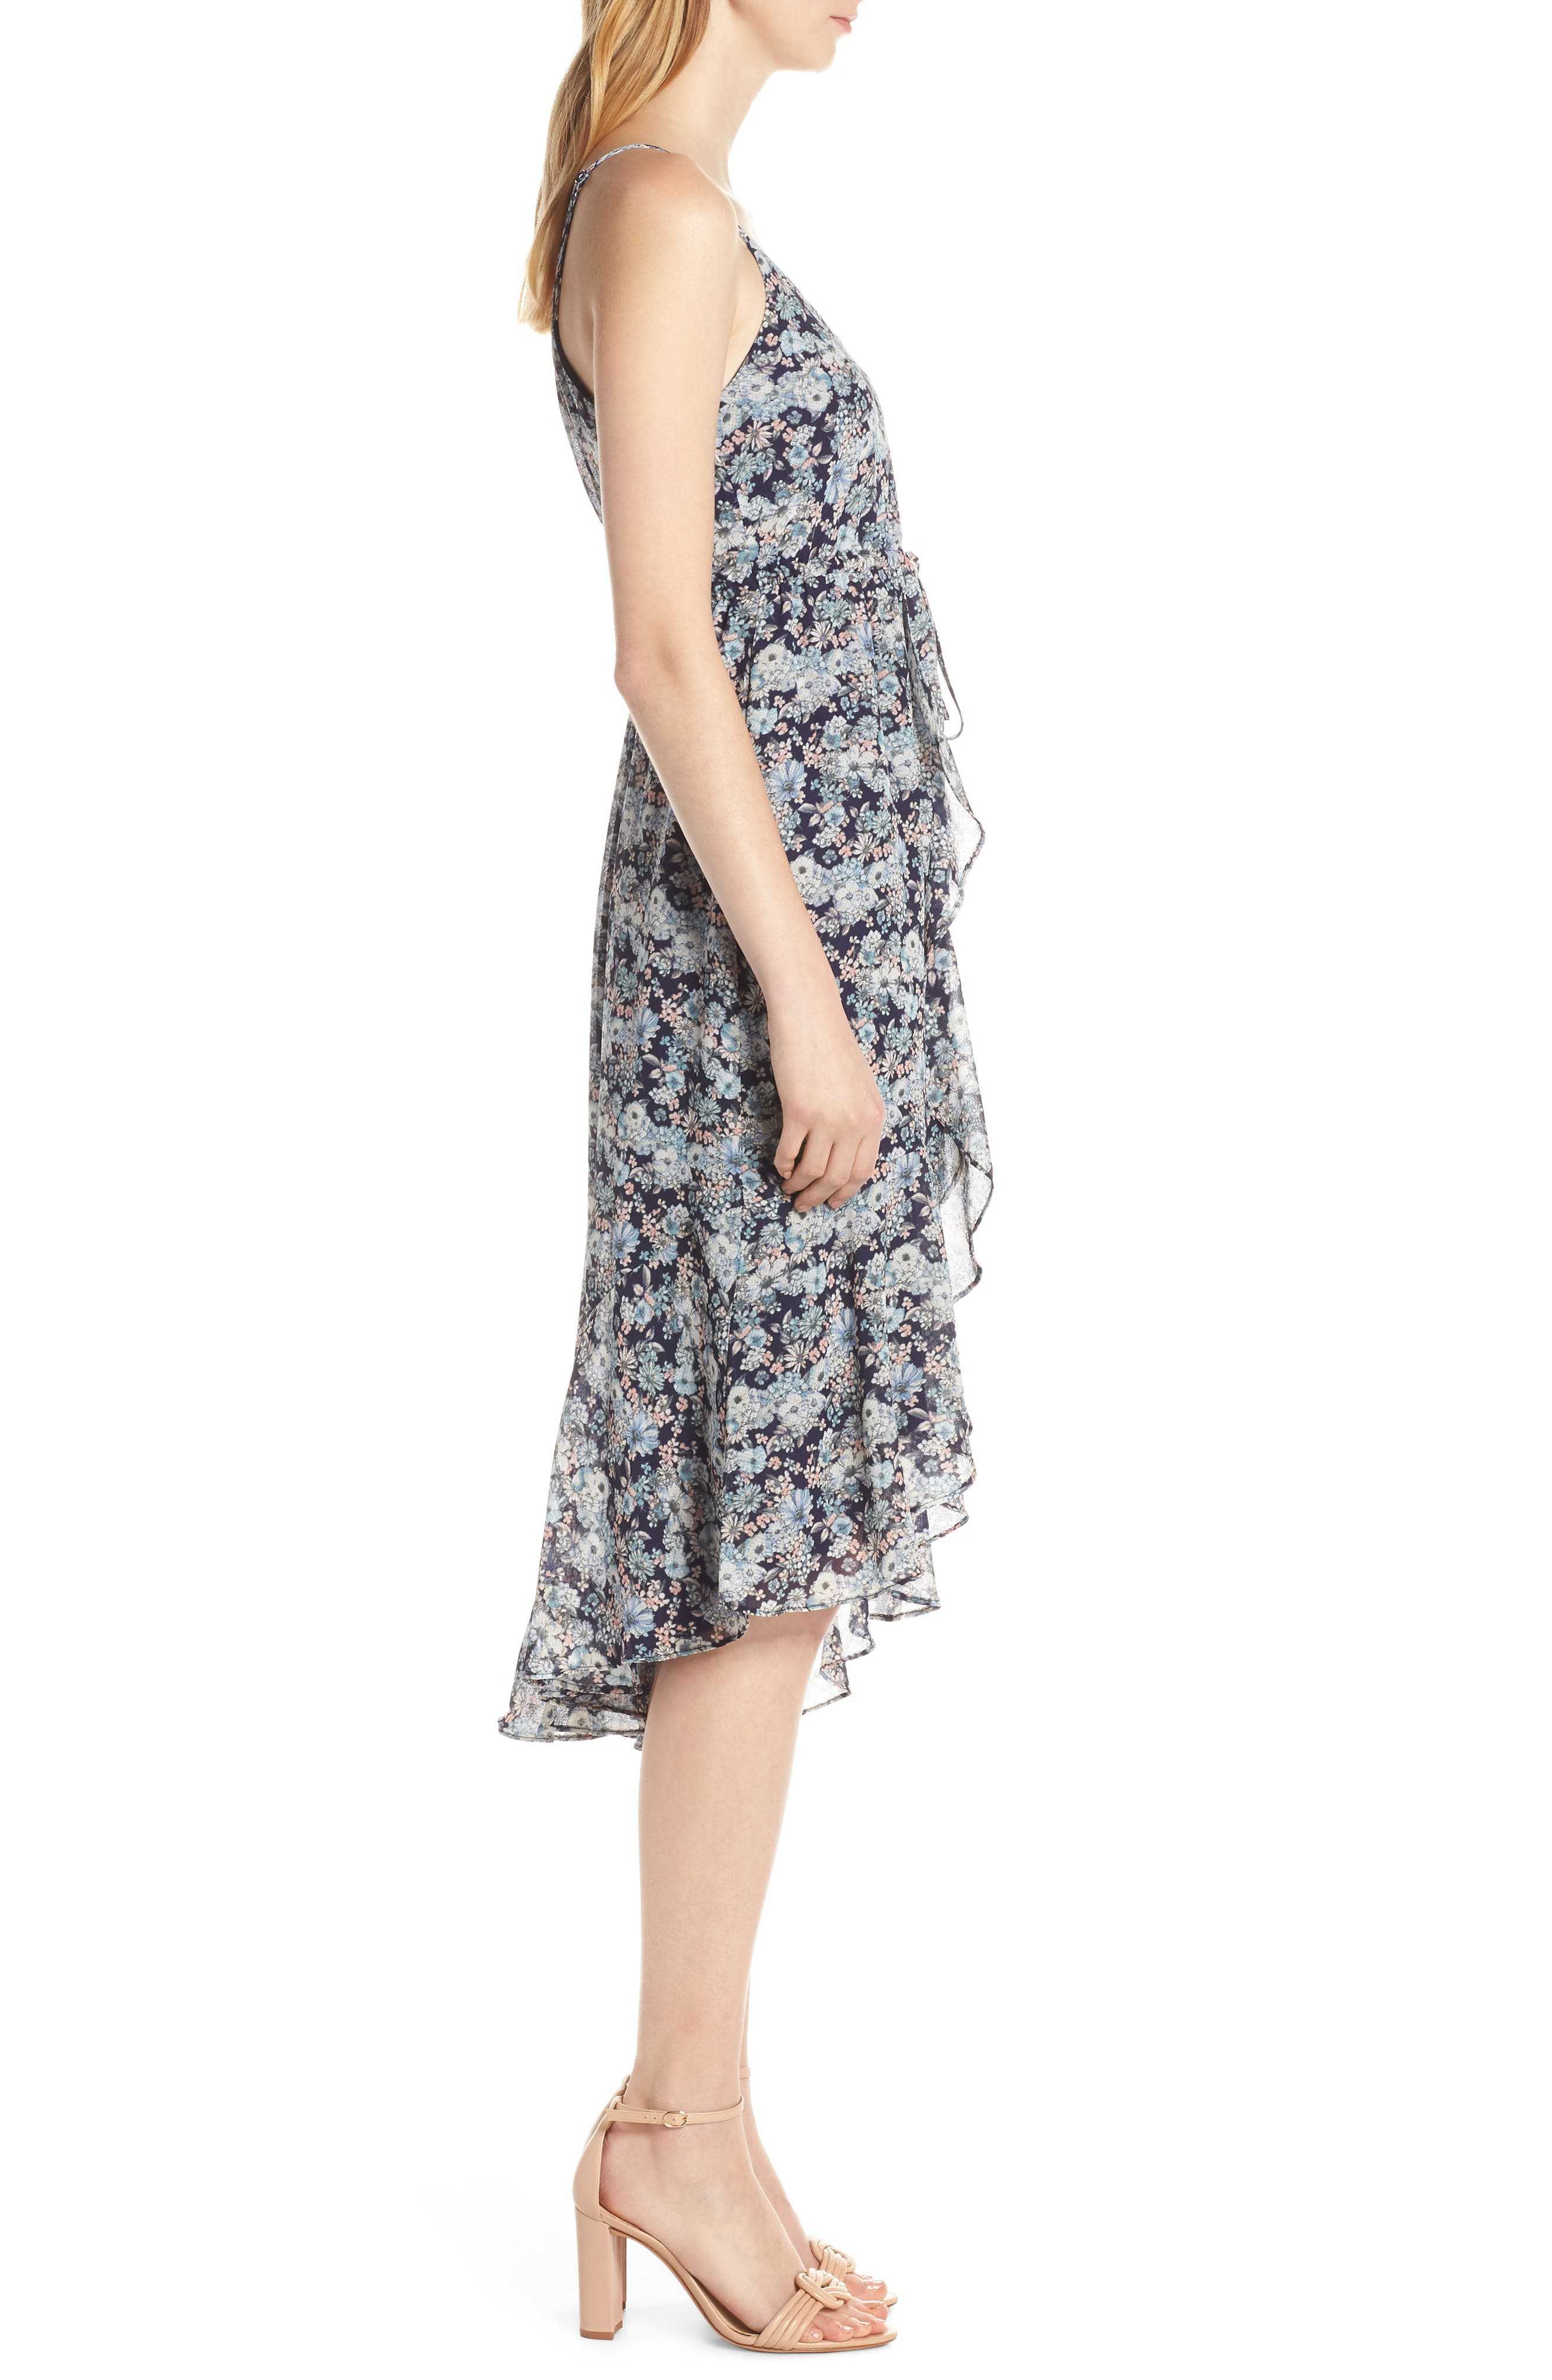 19 COOPER, Asymmetrical Ruffle Hem Dress, Alternate thumbnail 4, color, 410